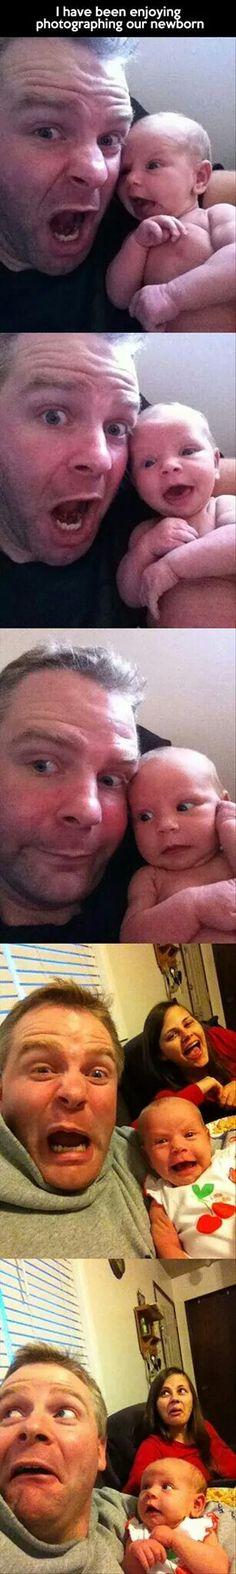 Copy babies expressions